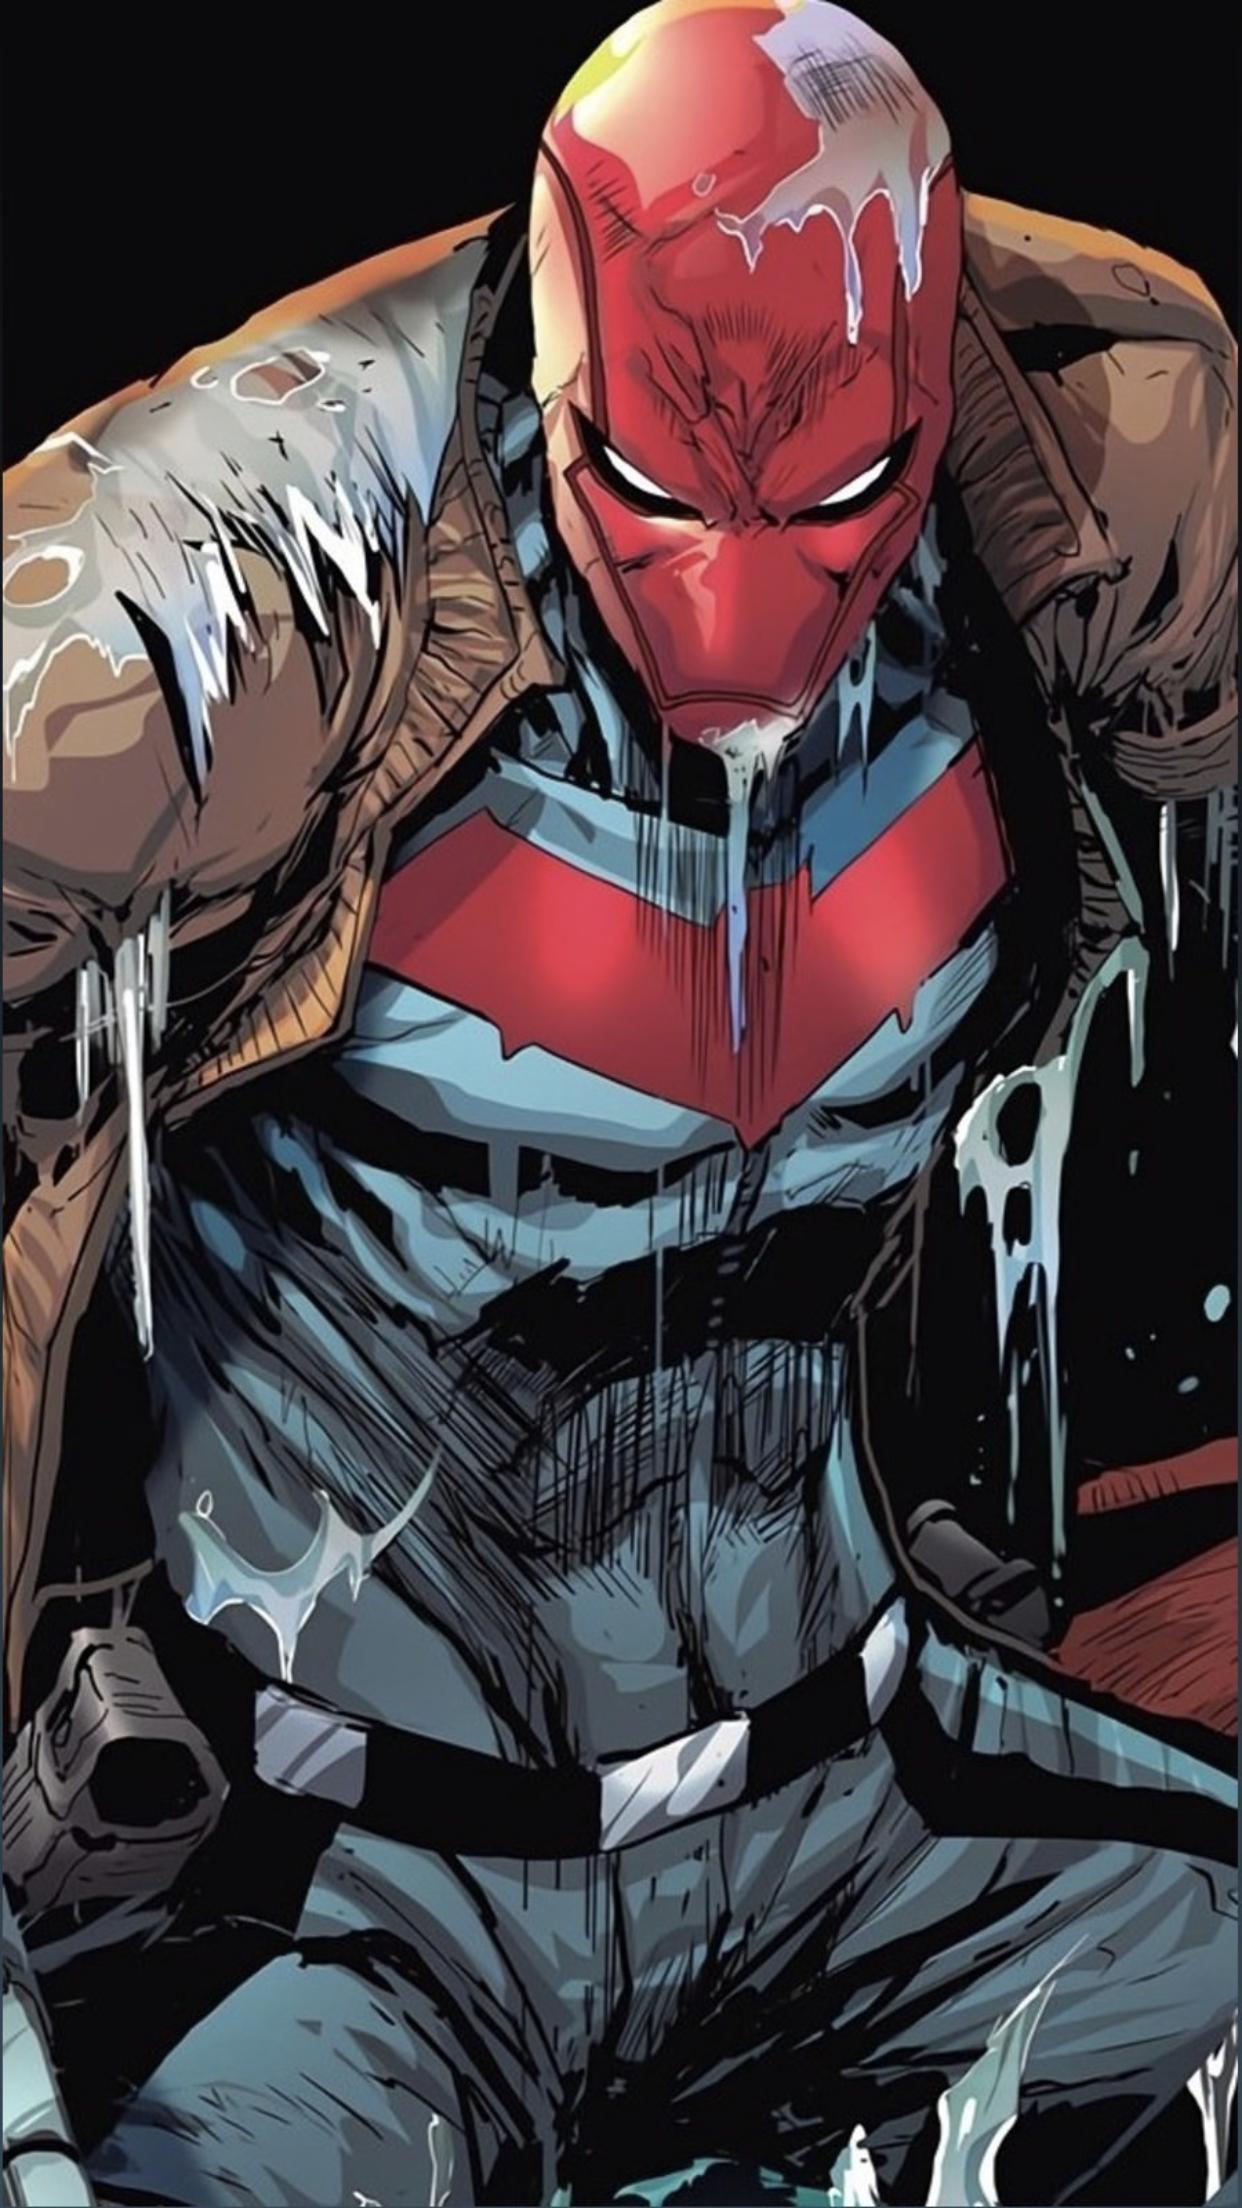 Pin By Pablo On Comic Art Batman Red Hood Red Hood Red Hood Wallpaper